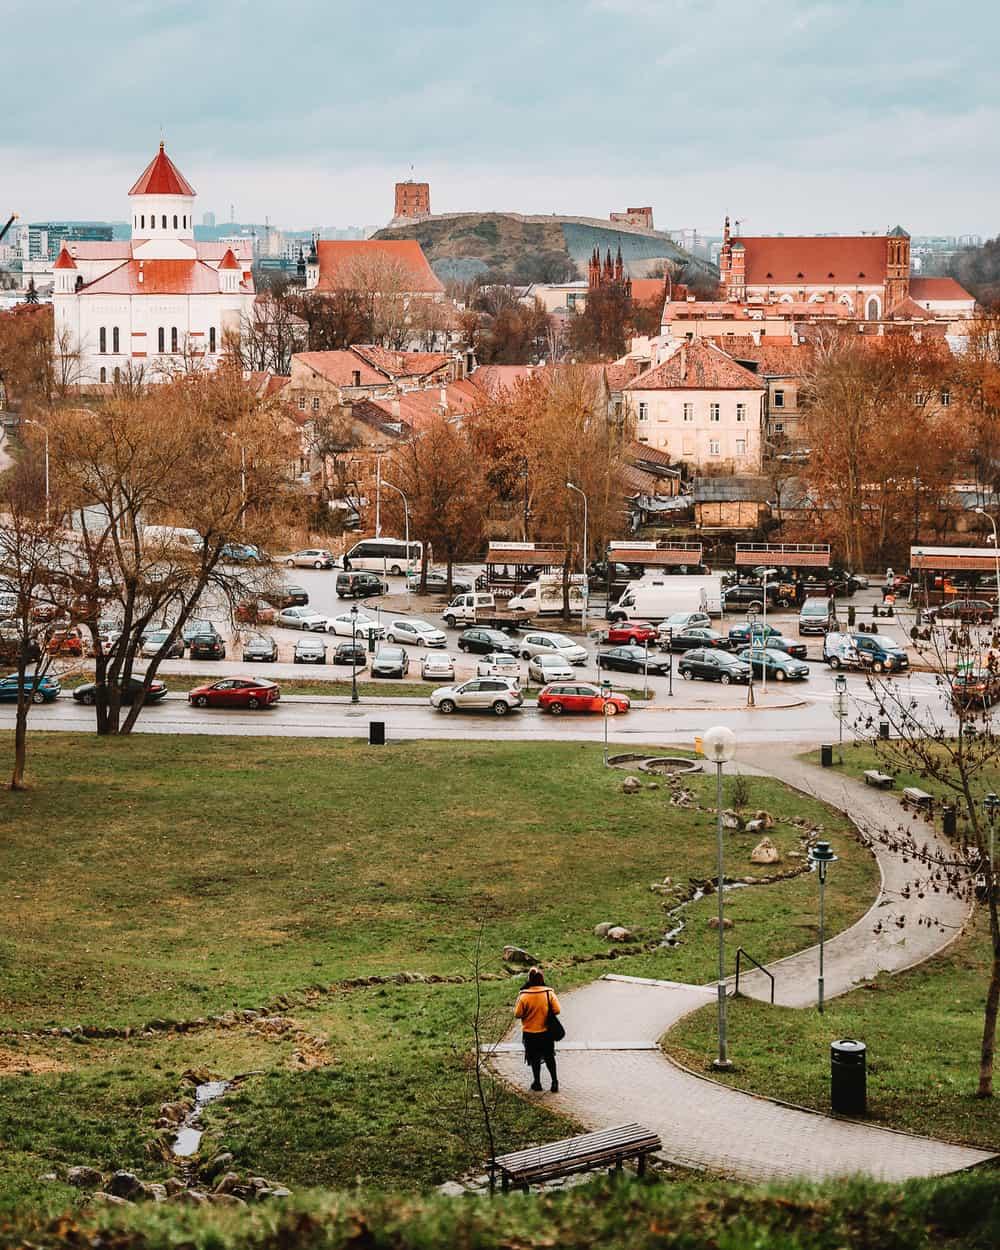 Vilnius City Bastion Viewpoint | Viewpoints in Vilnius